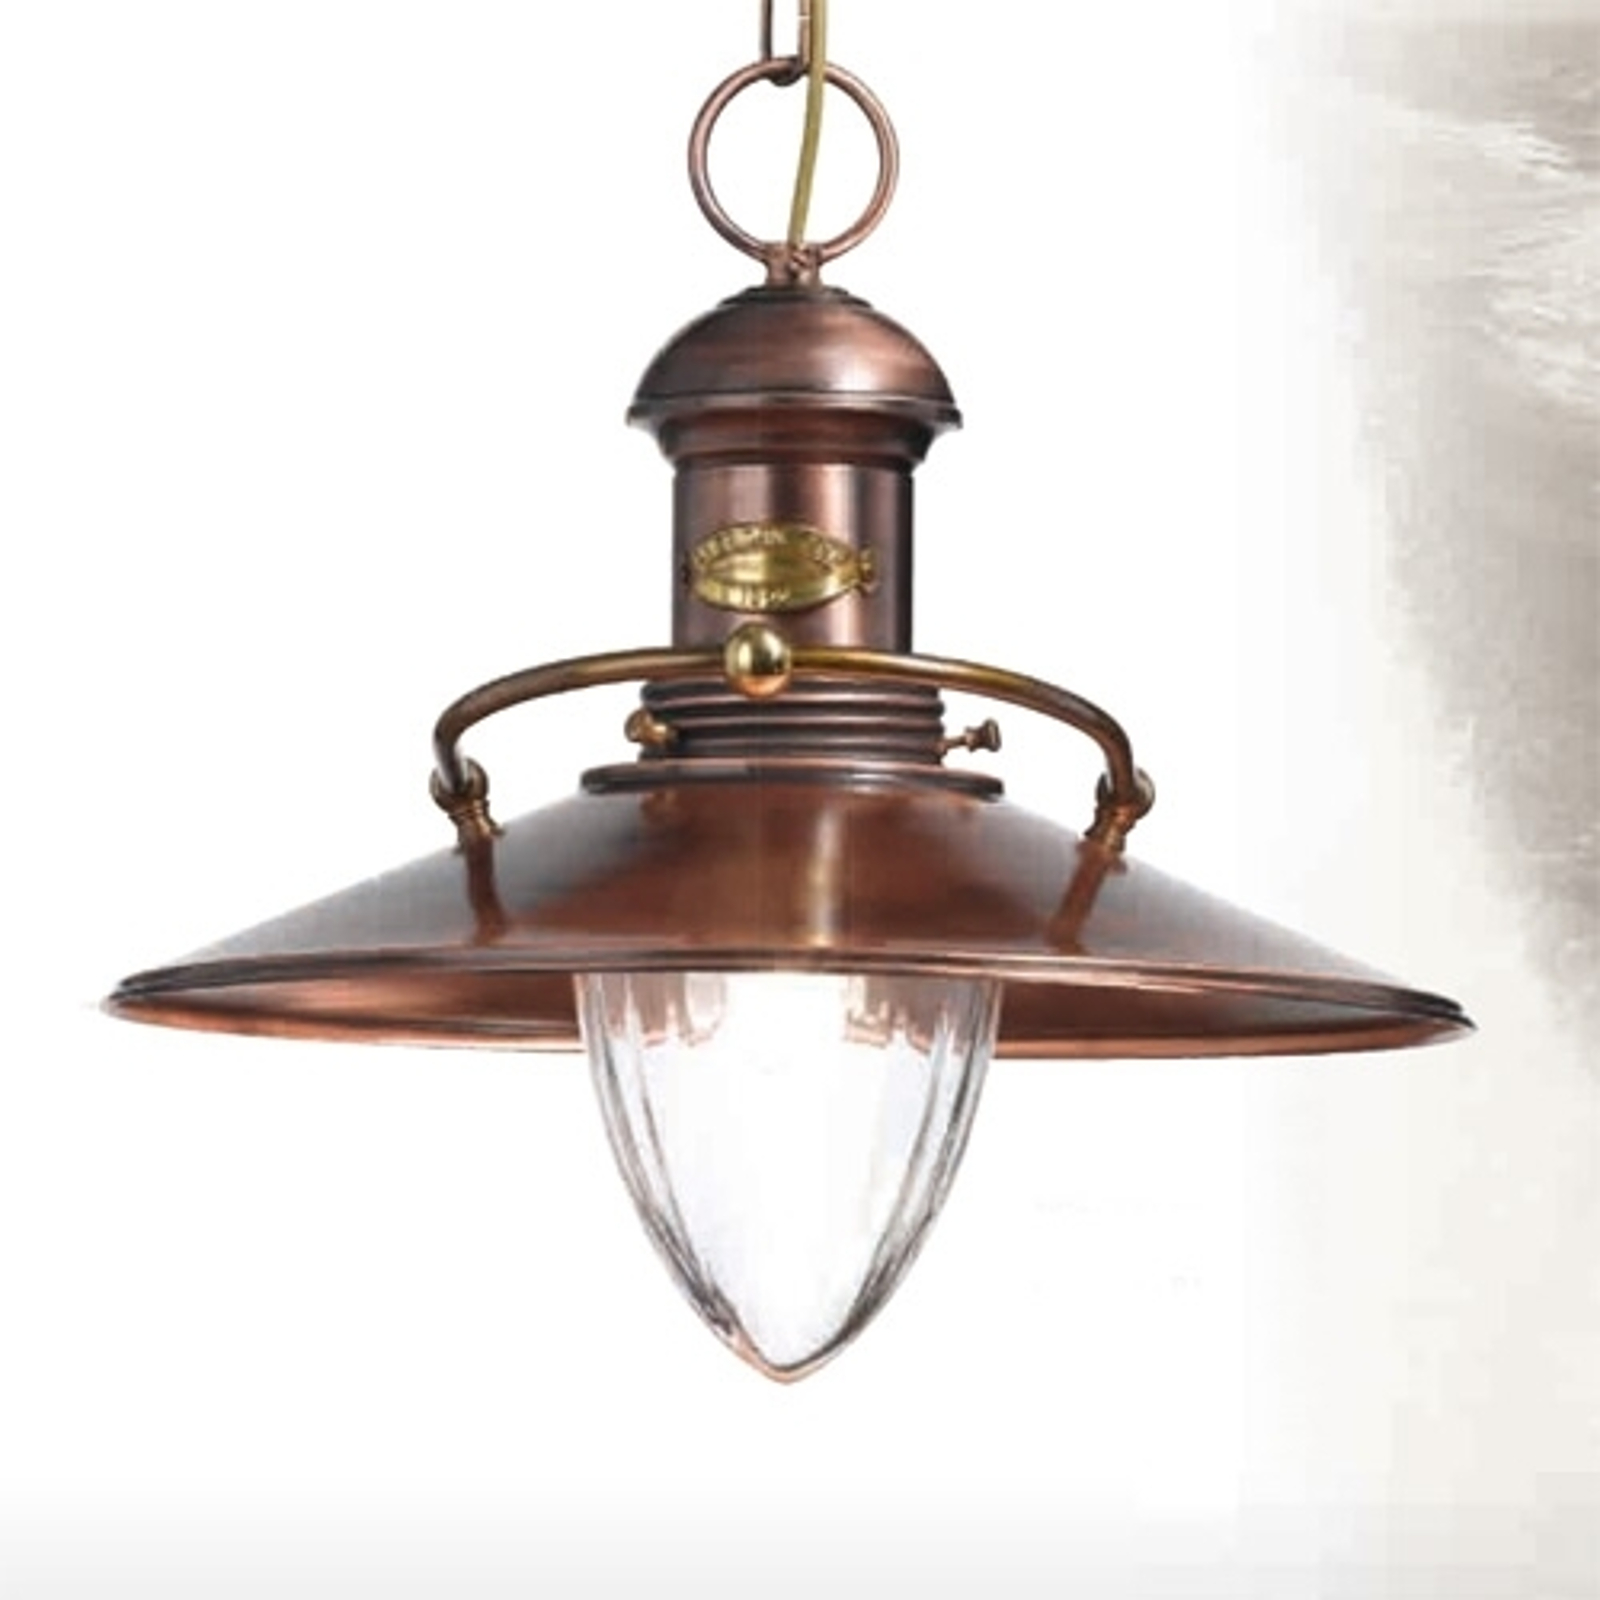 Scia - lámpara colgante antigua en cobre